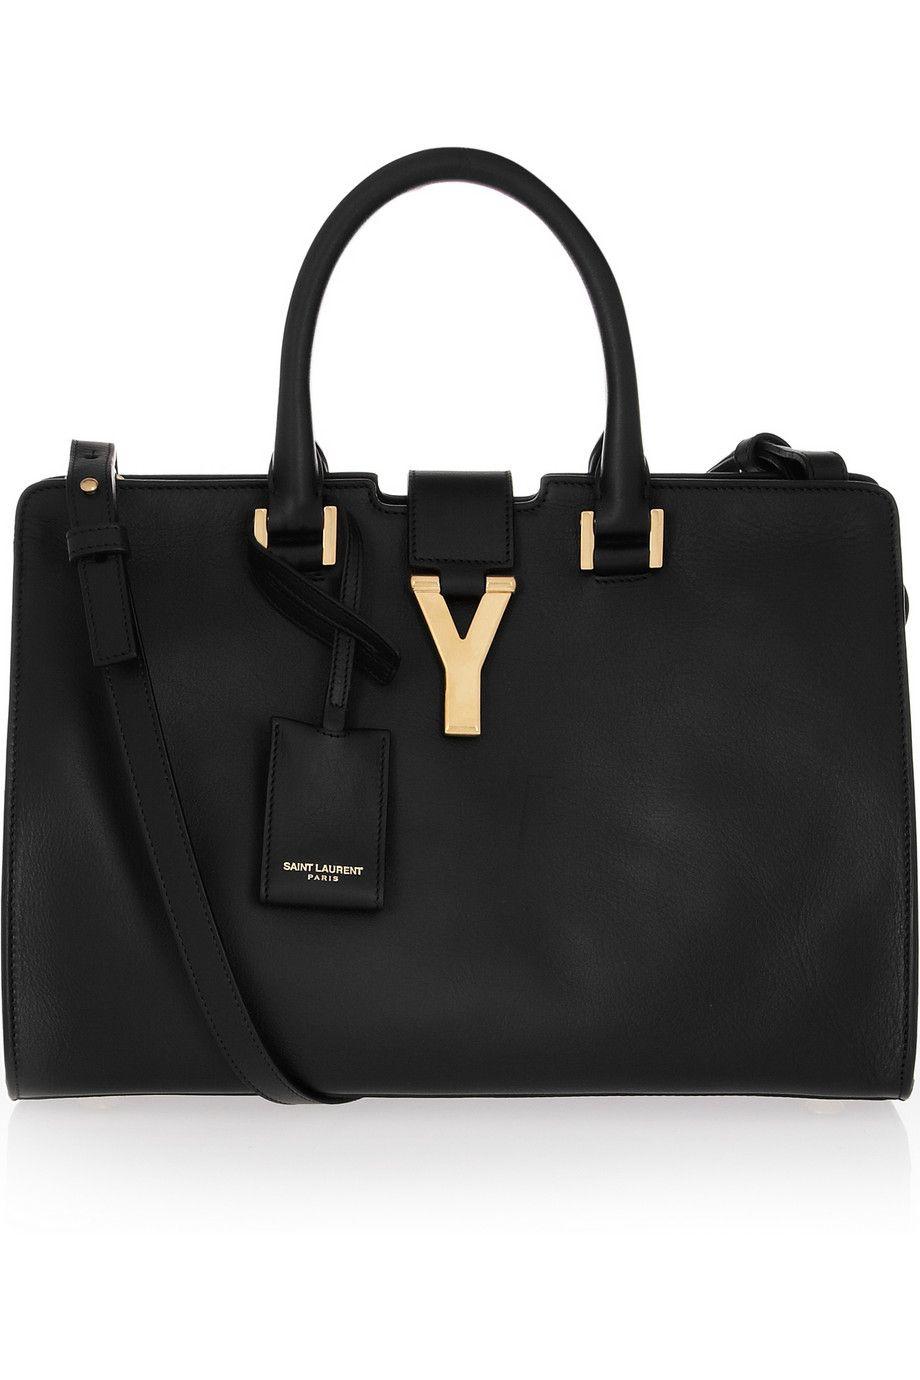 64b1da7614 Saint Laurent's classic Cabas Y in Black Leather. The lovely shoulder strap  makes this so versatile.